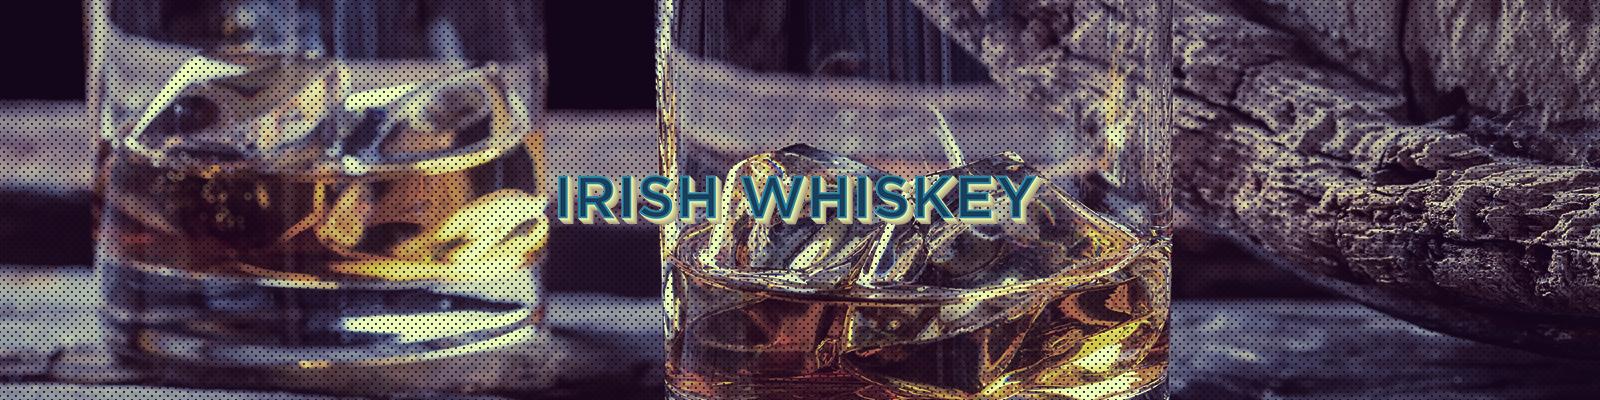 Irish Whiskeys